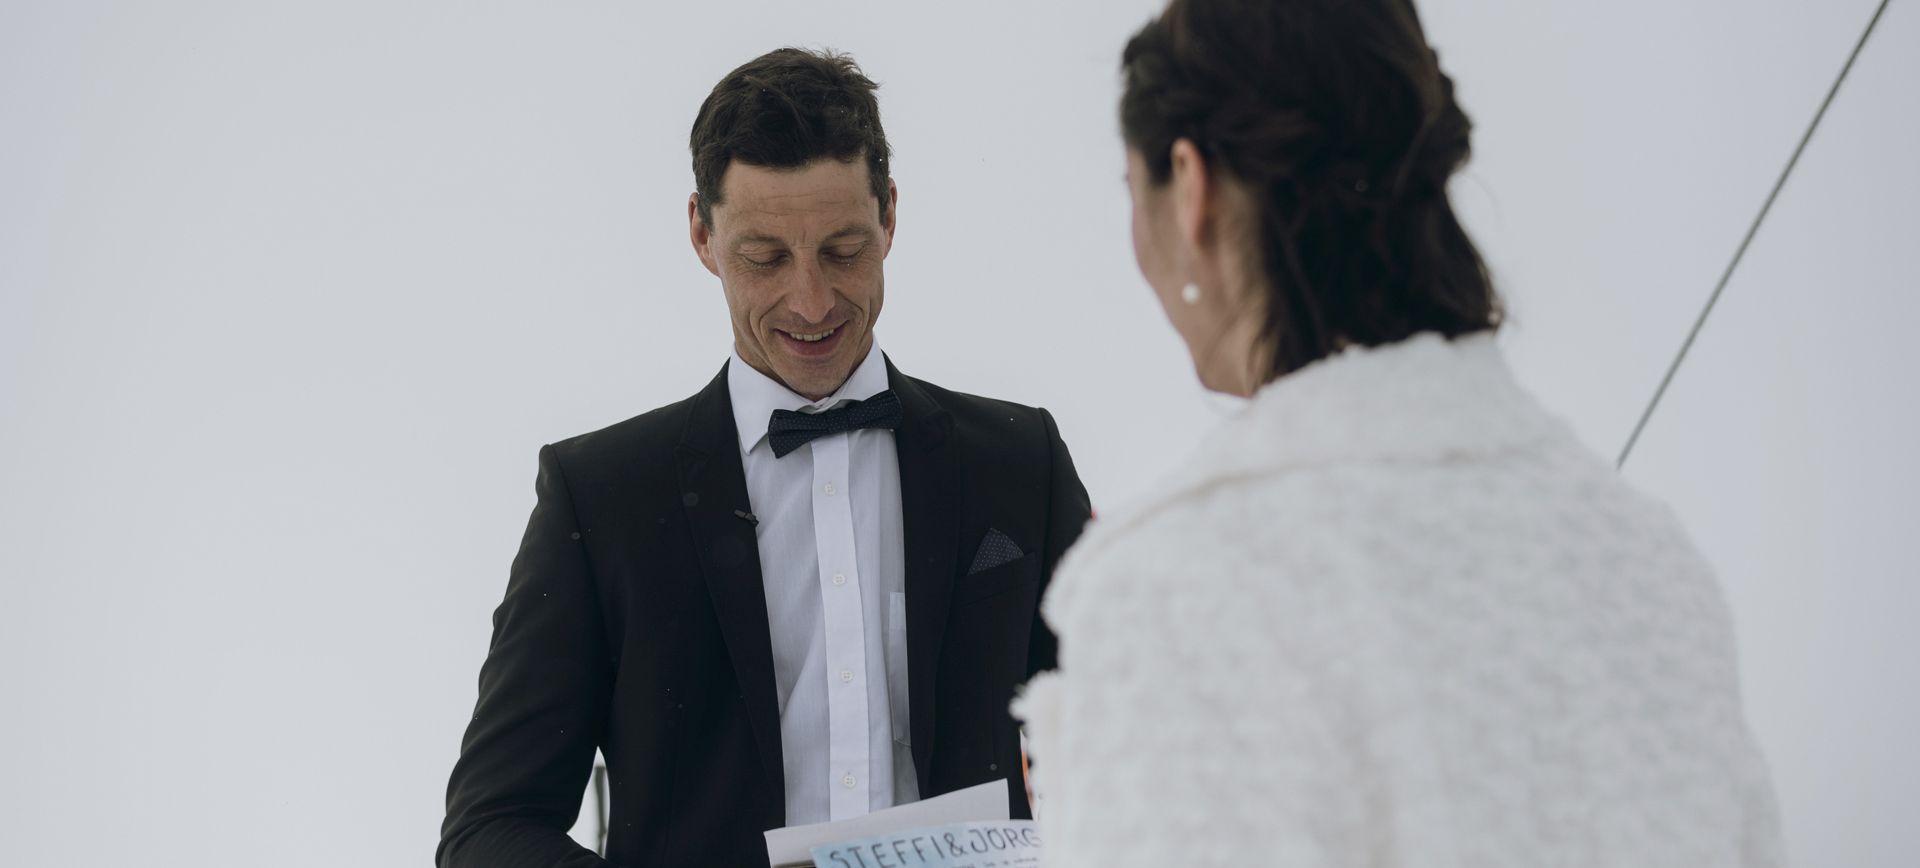 mountain elopement ceremony in austria